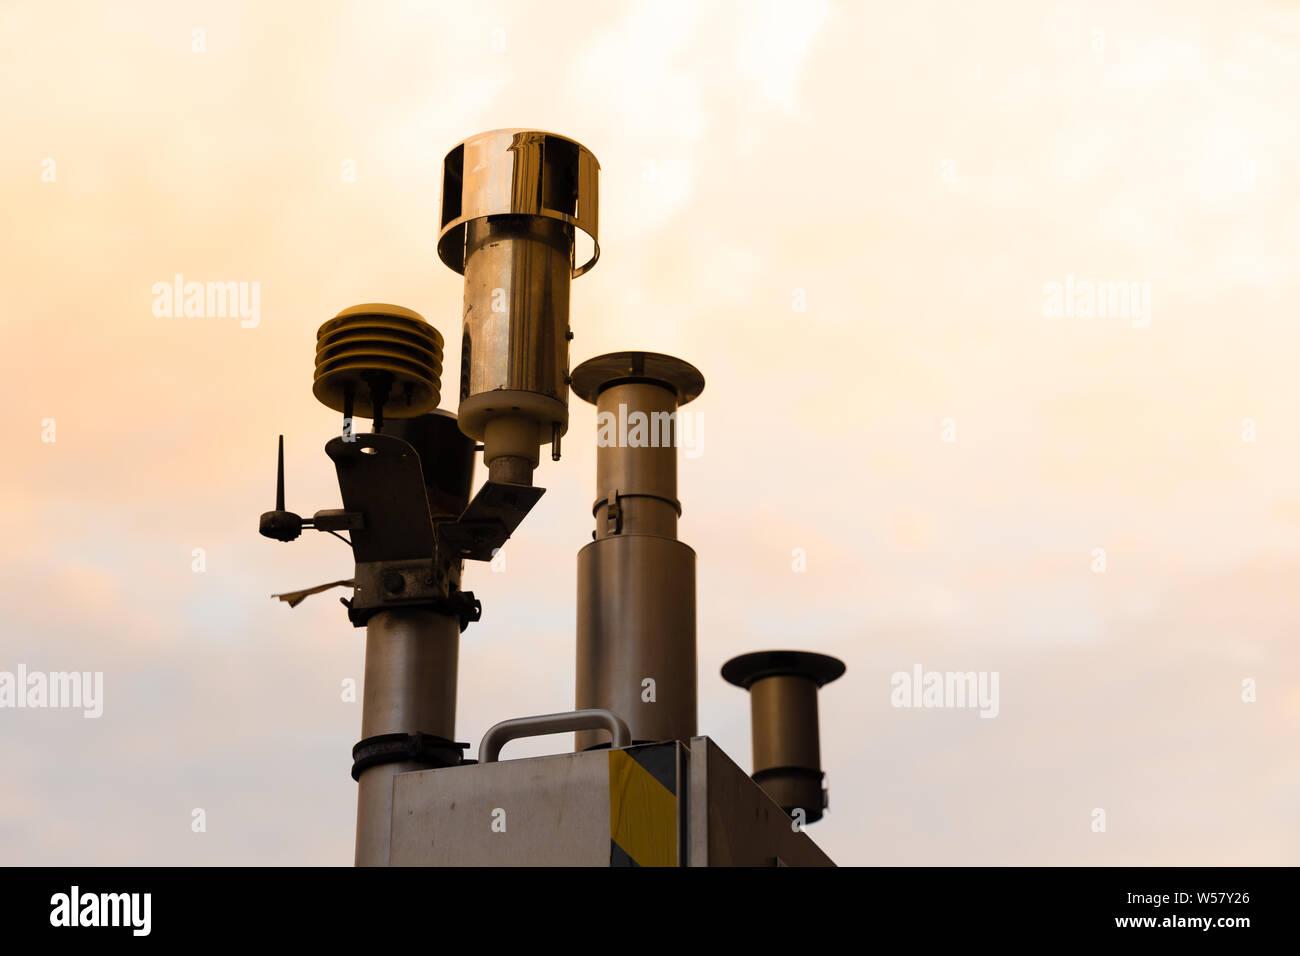 Messstation Feinstaub Belastung CO2 Diesel Fahrverbot Stock Photo